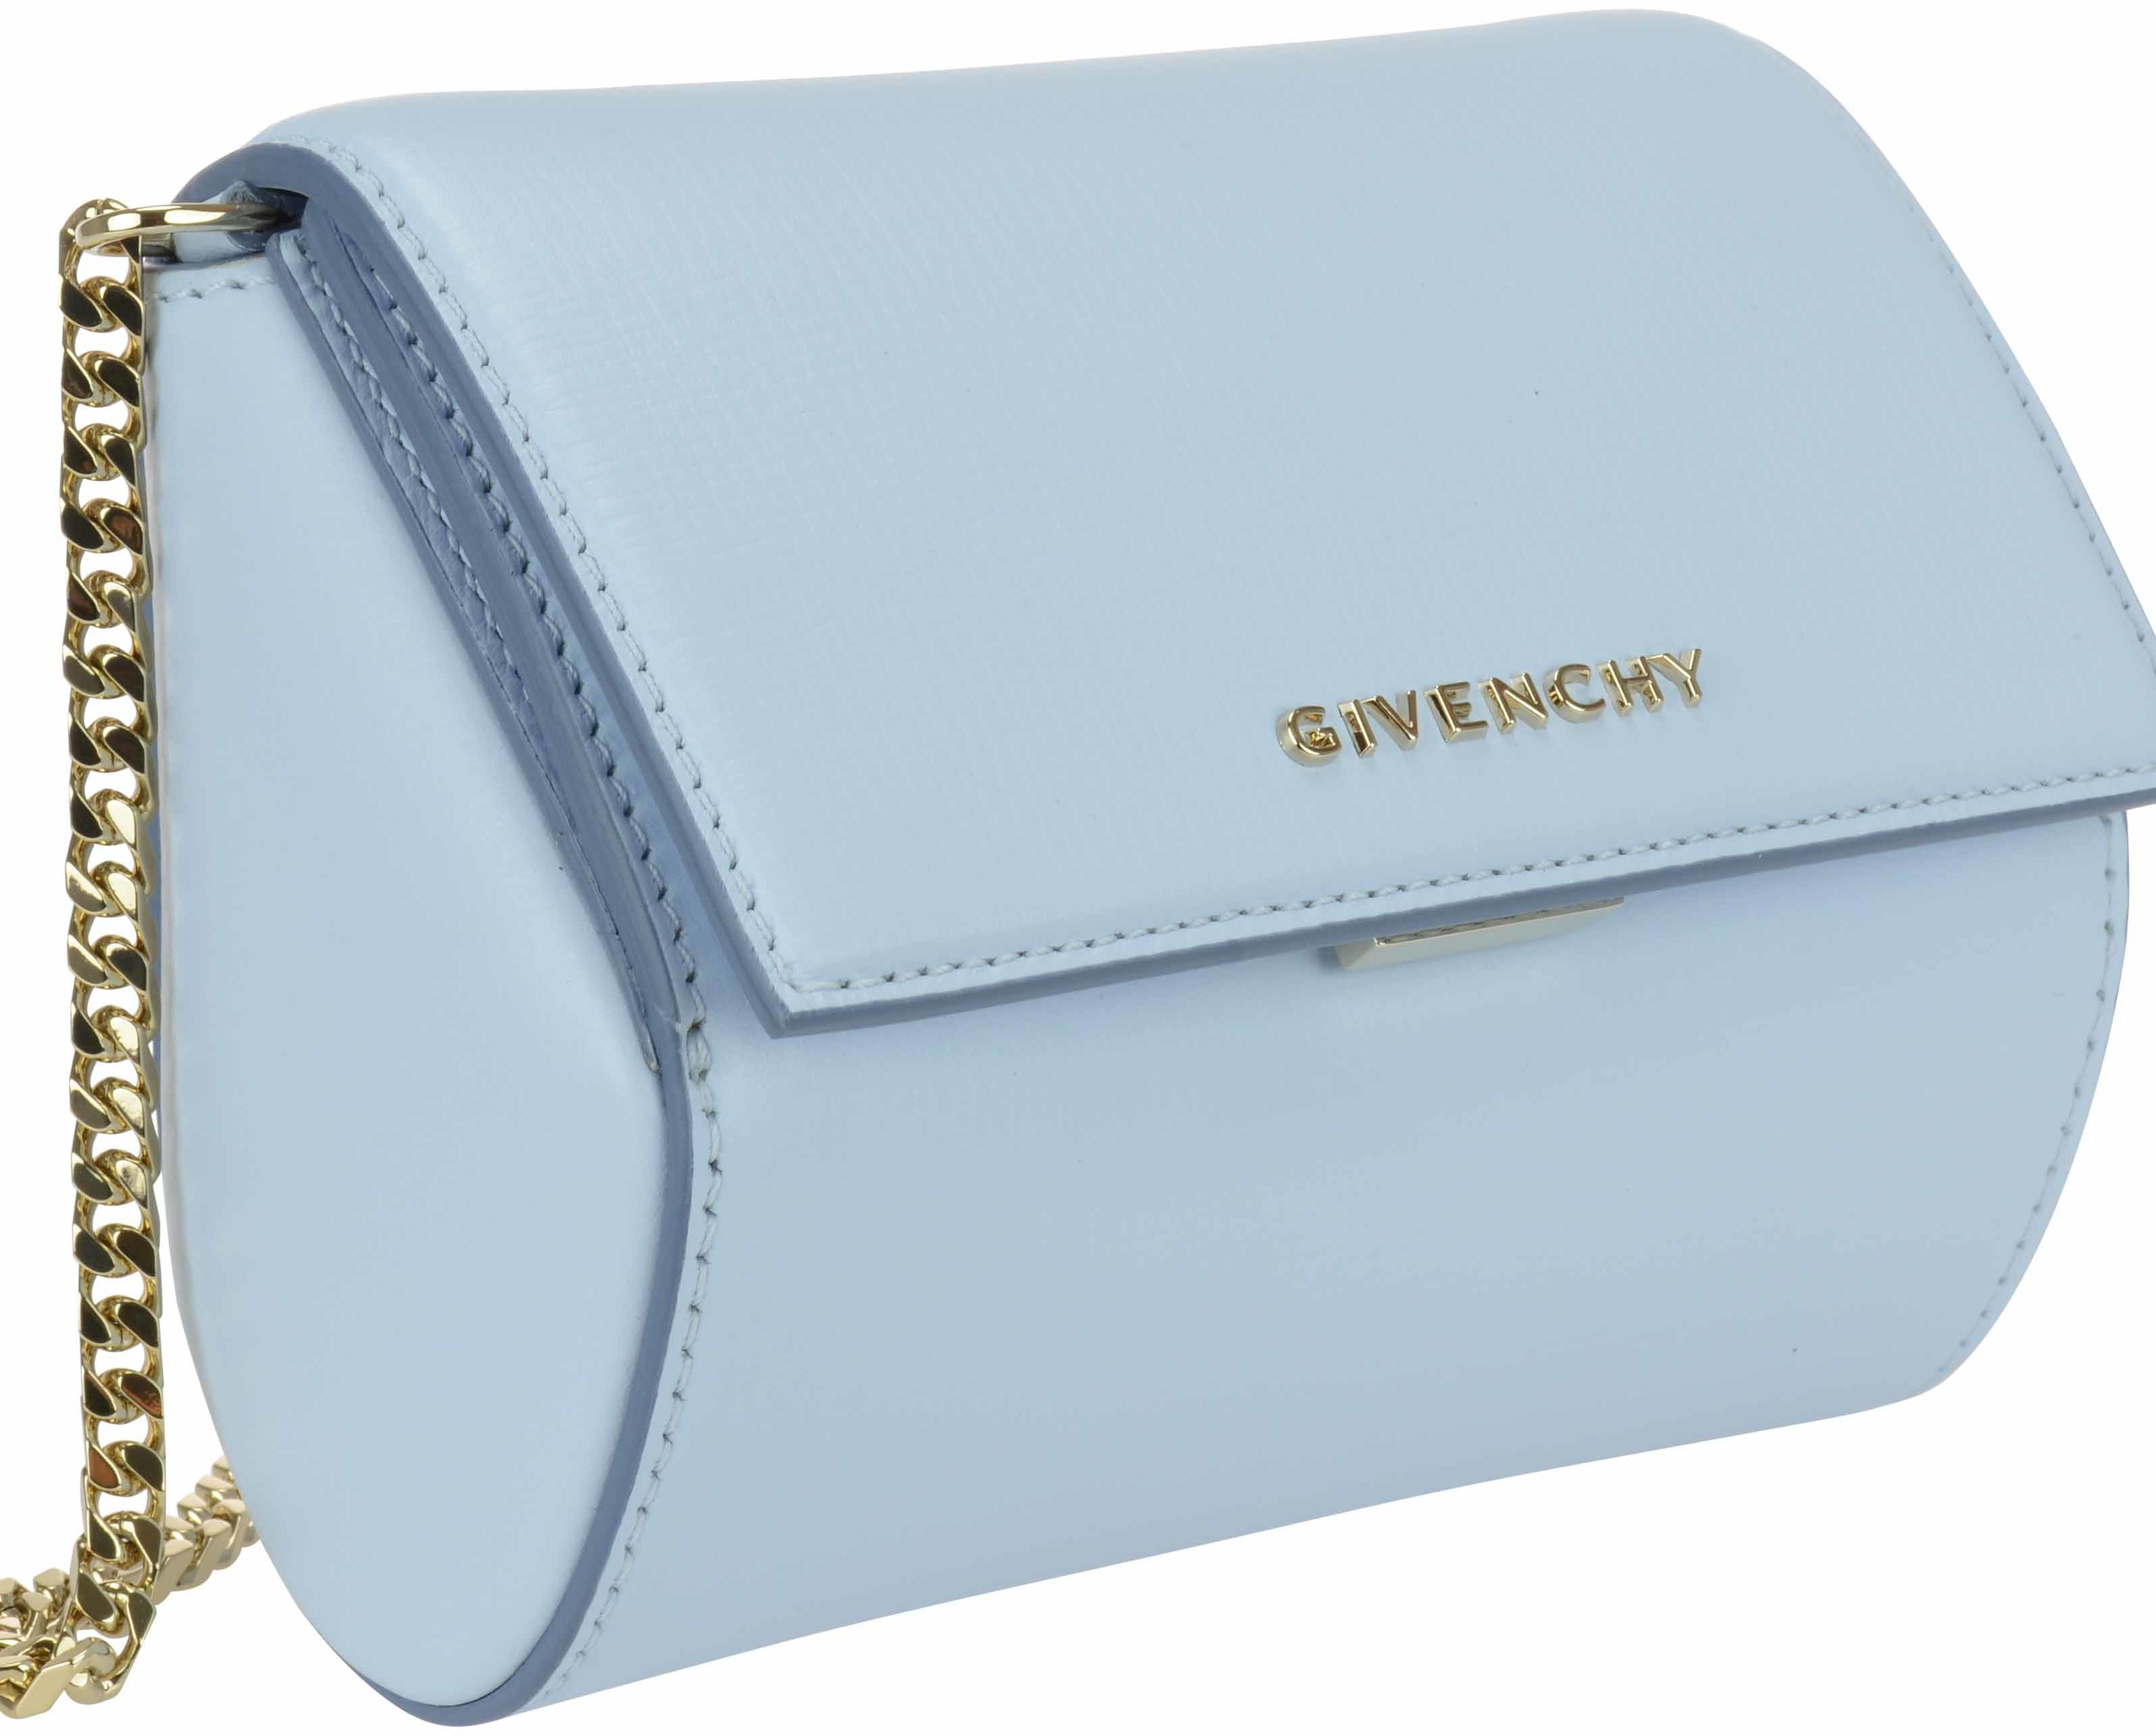 Givenchy Pandora Box Micro Chain Bag